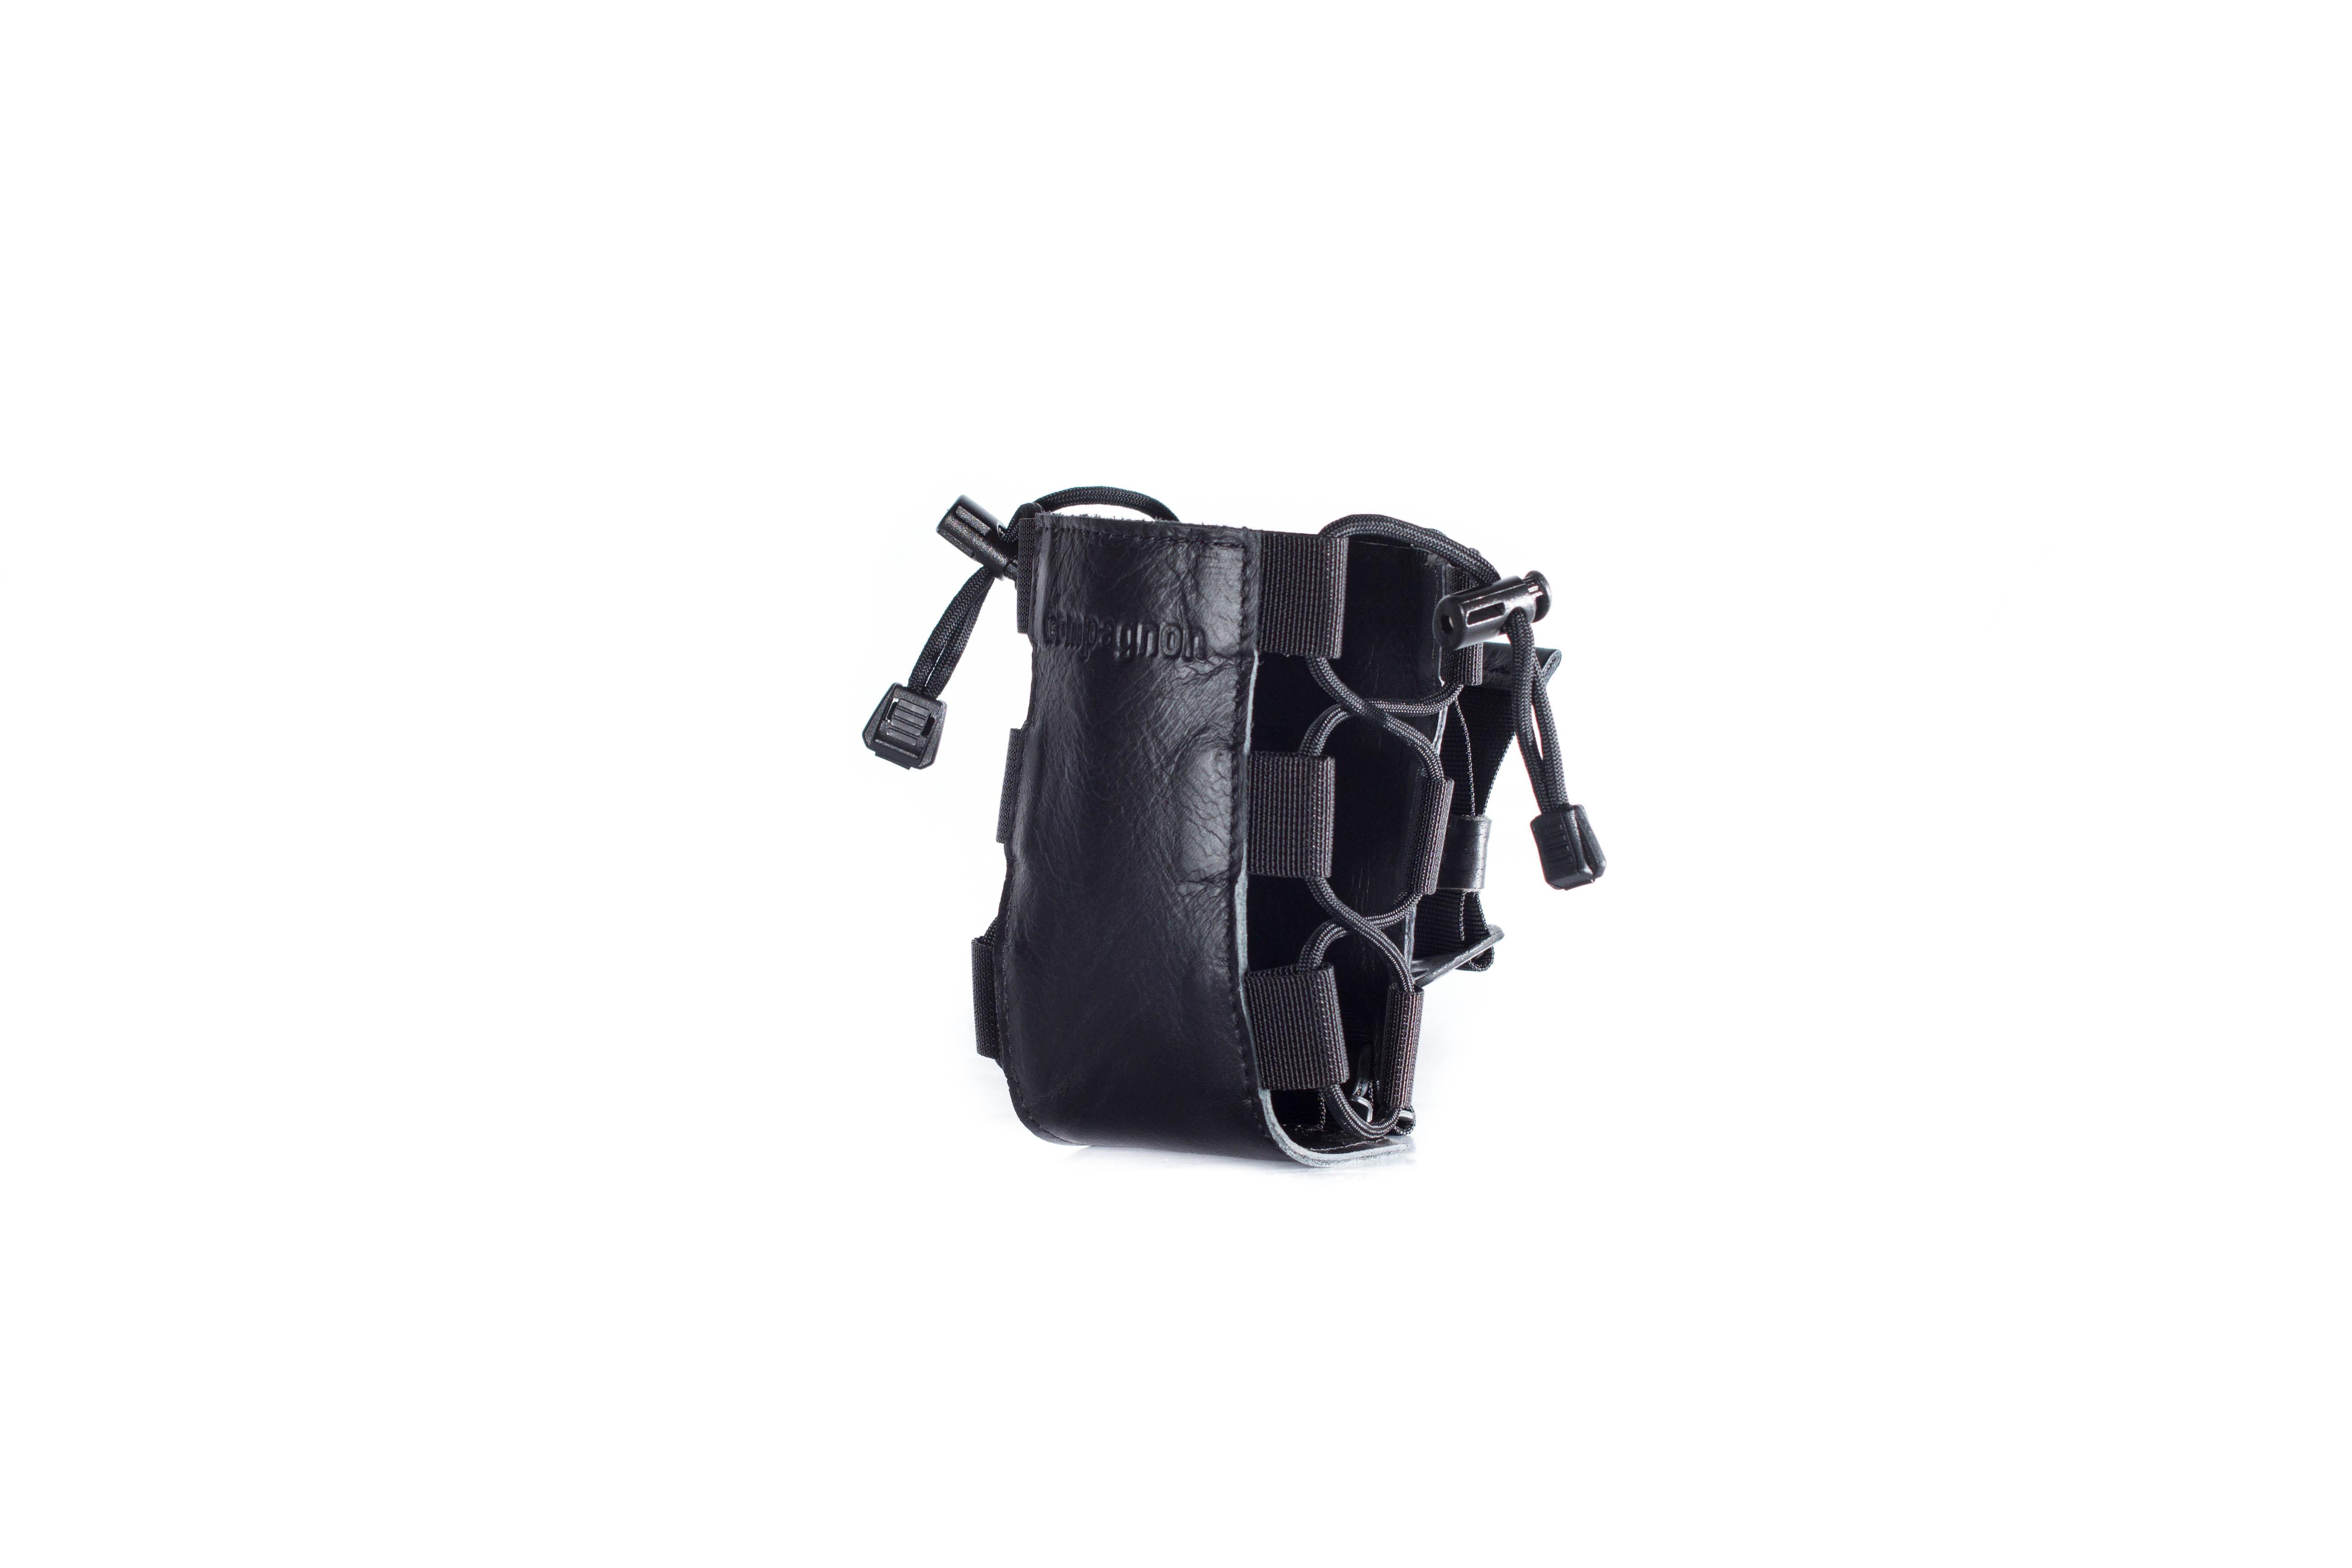 compagnon_quiver_tripod_stativ_koecher_halter_black_leather_05-full